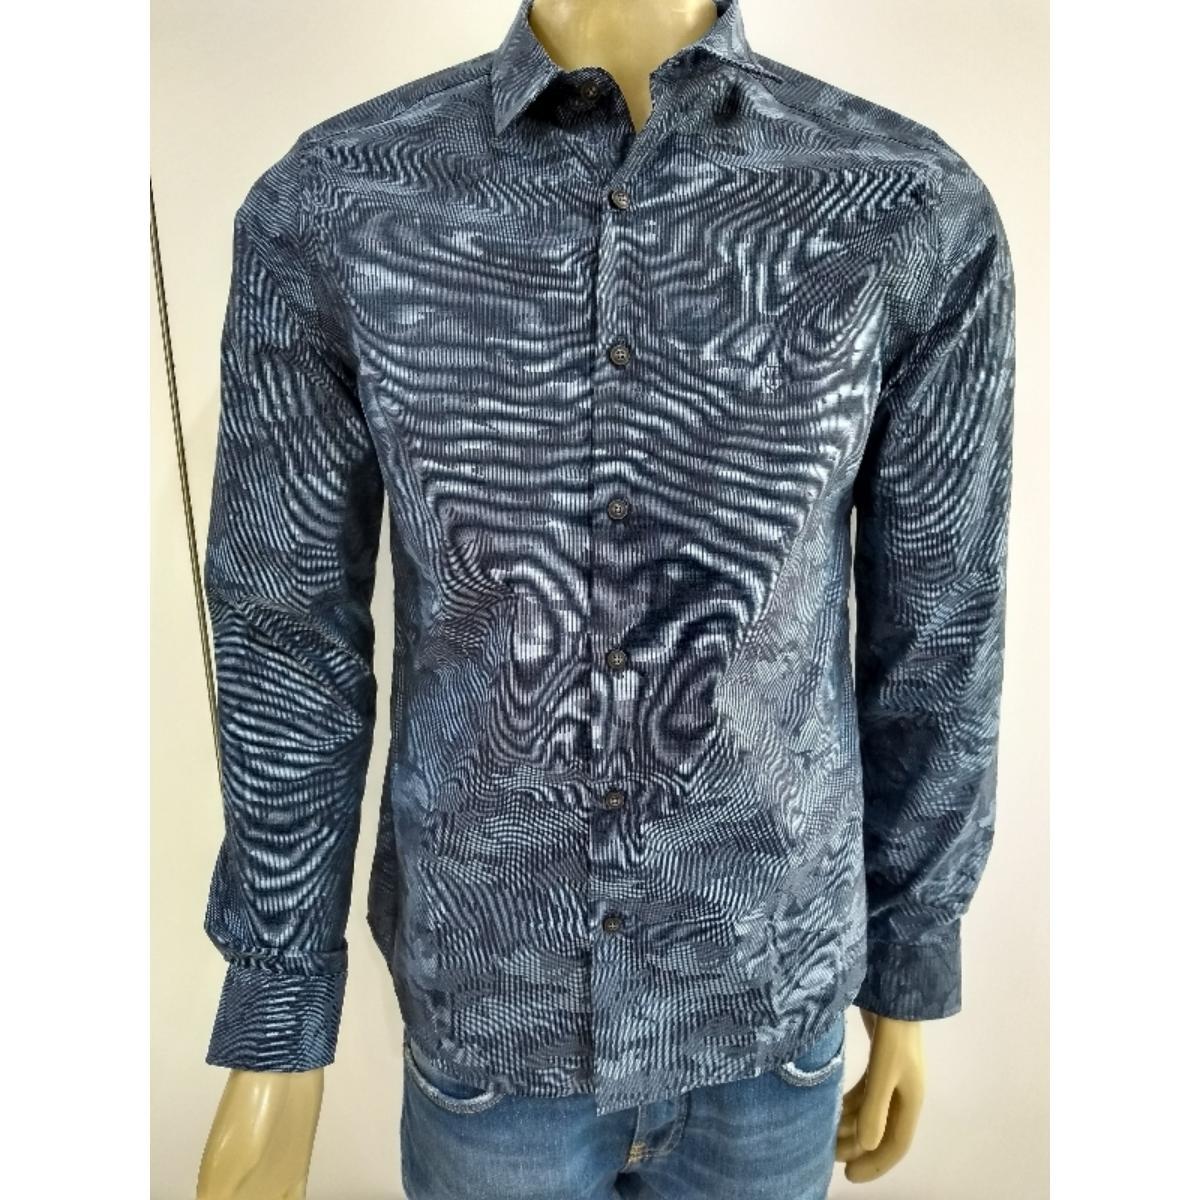 Camisa Masculina Individual 53.03.1002 48 Azul